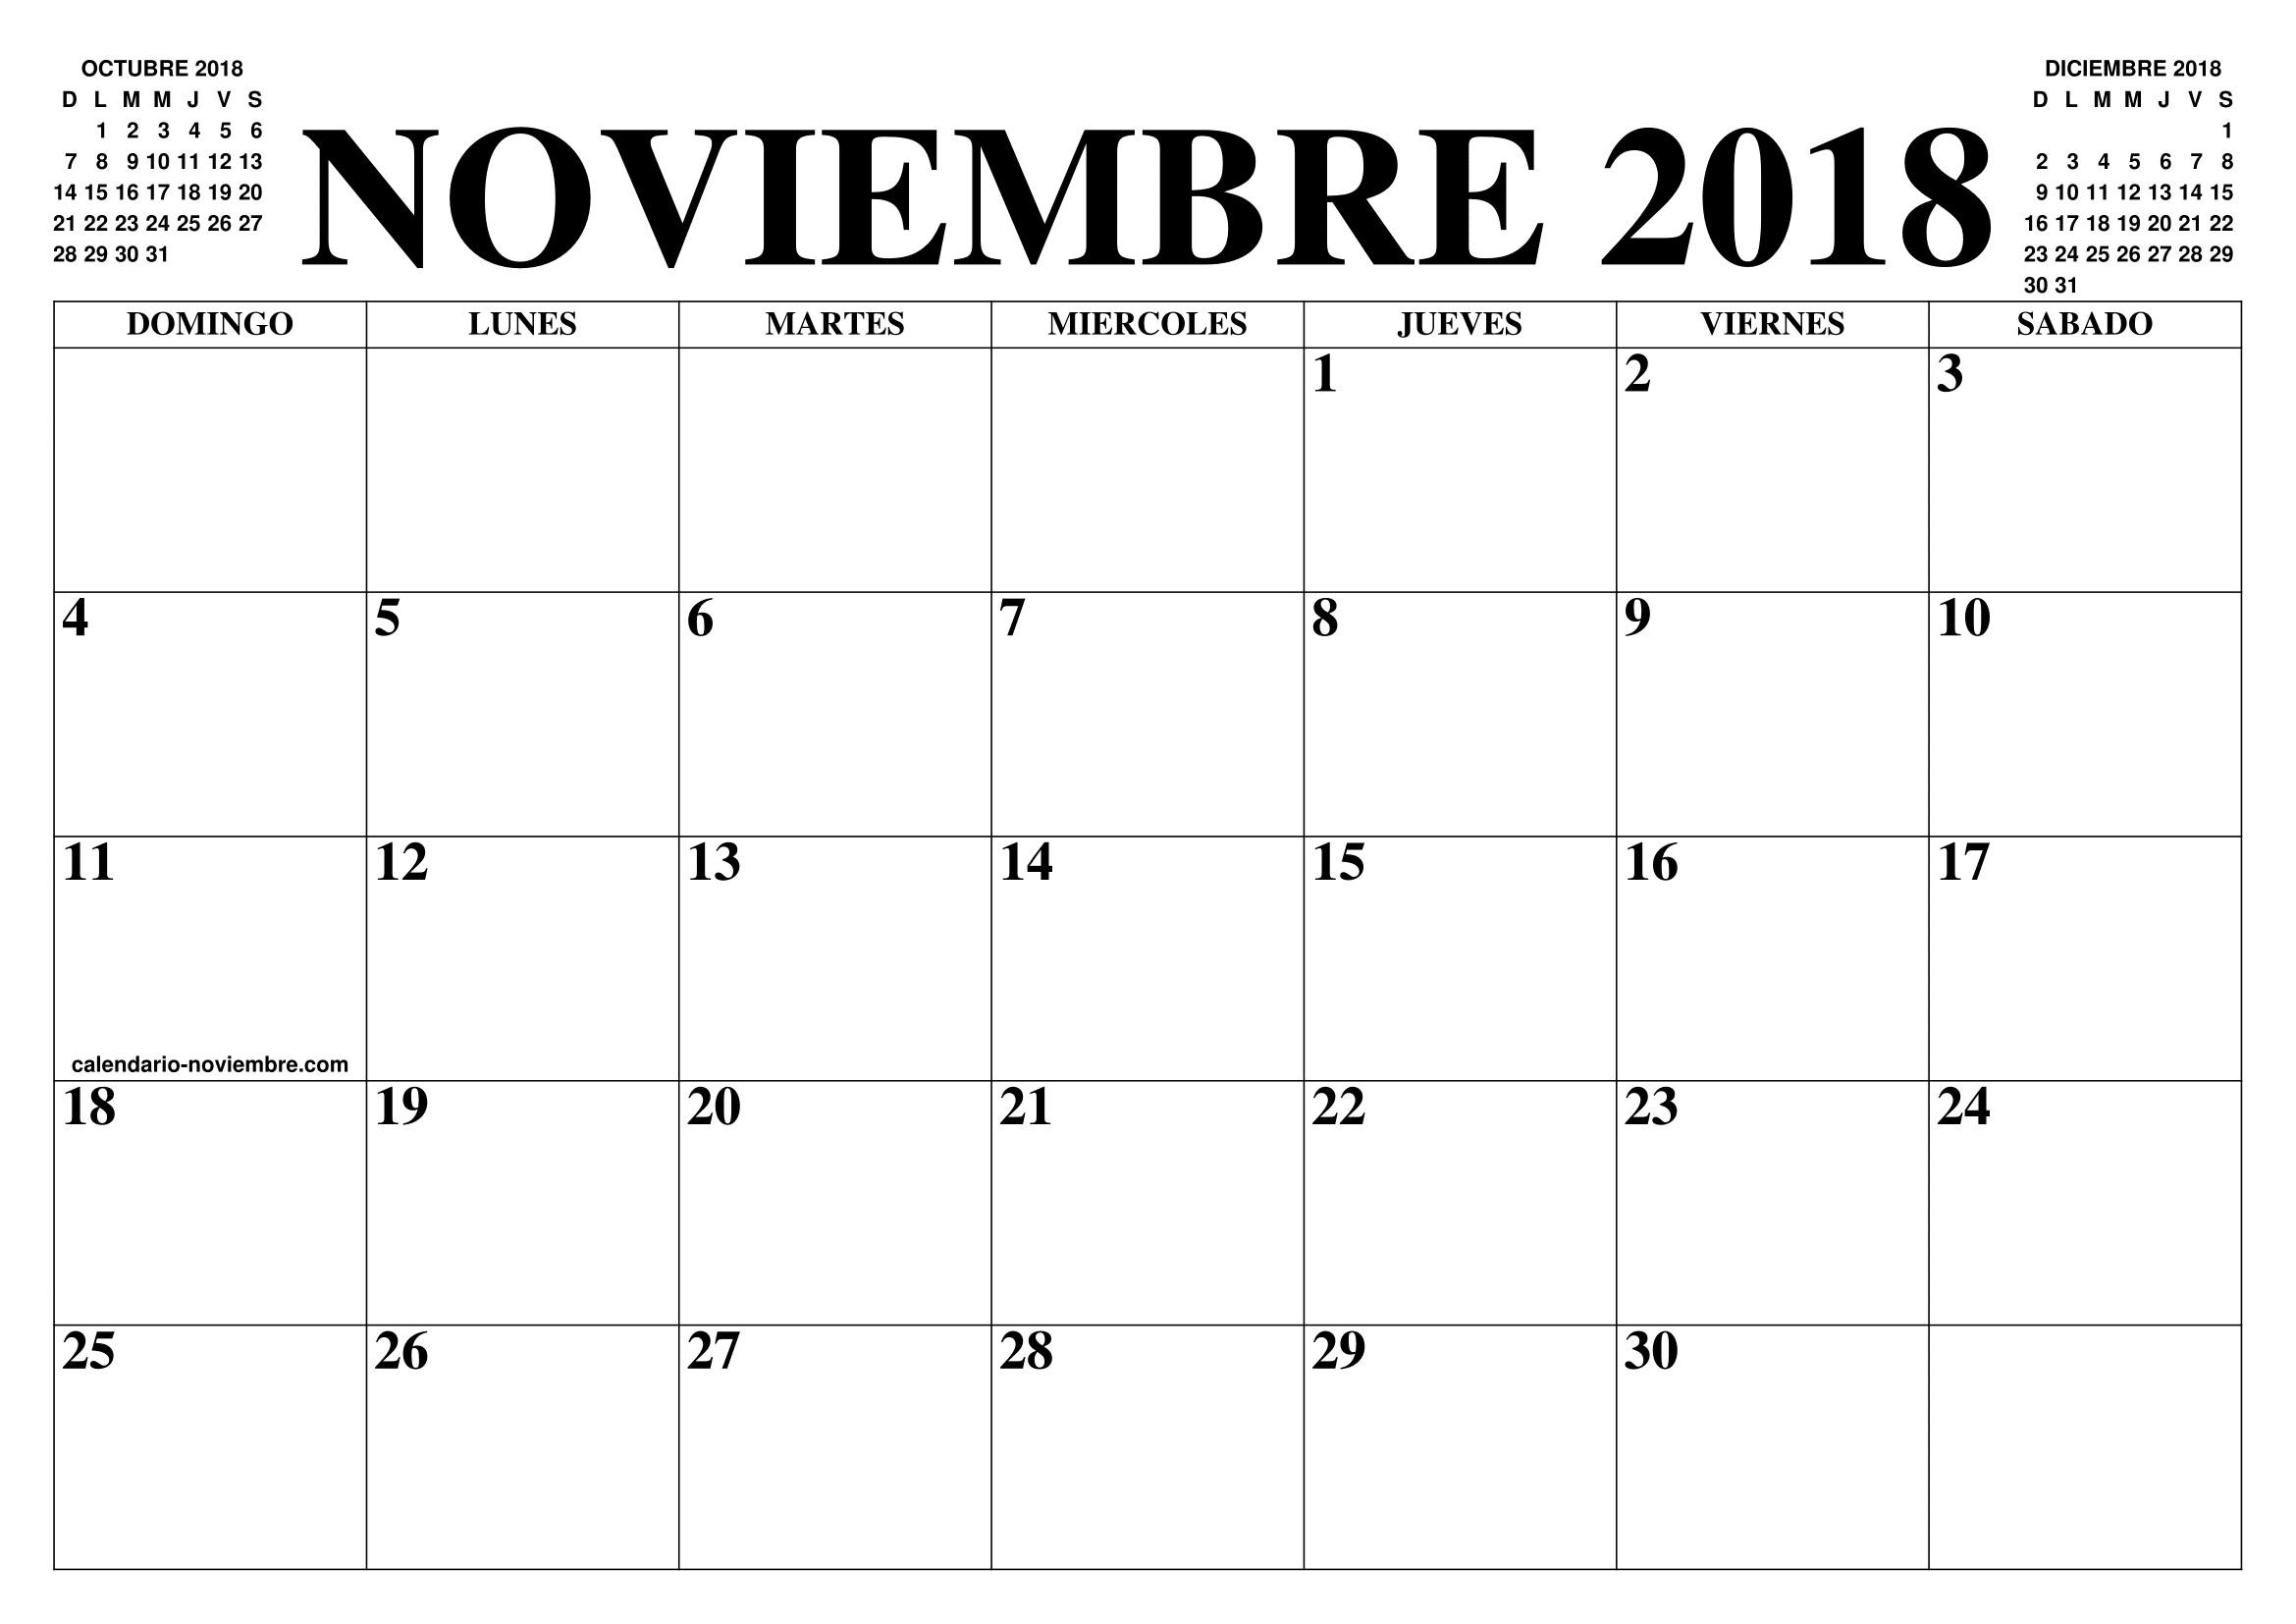 Calendario de octubre 2018 Calendario de octubre 2018 Noviembre de 2018